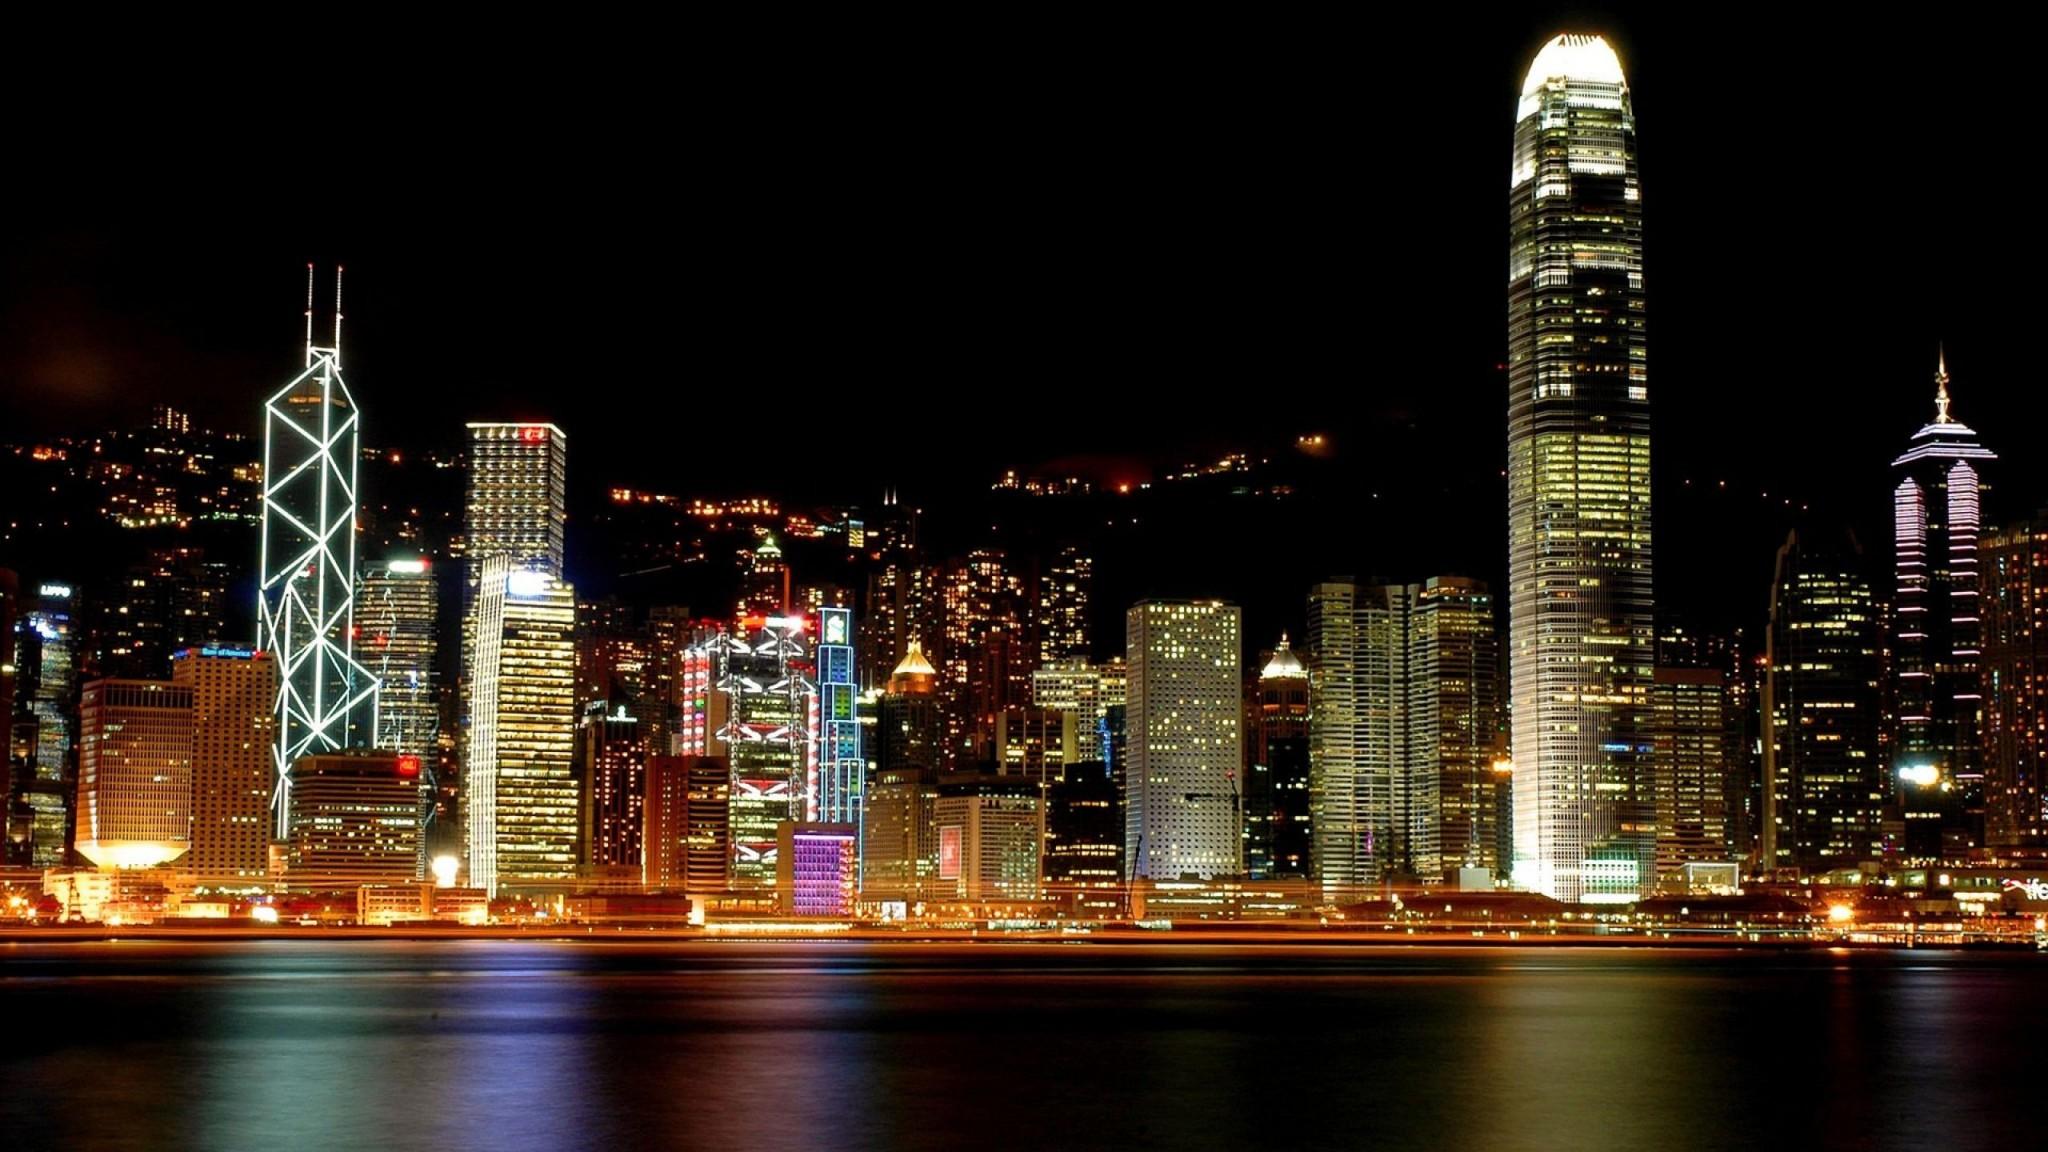 Hong Kong  Architecture  city  colors  cool  night  scene  sea HD Wallpaper